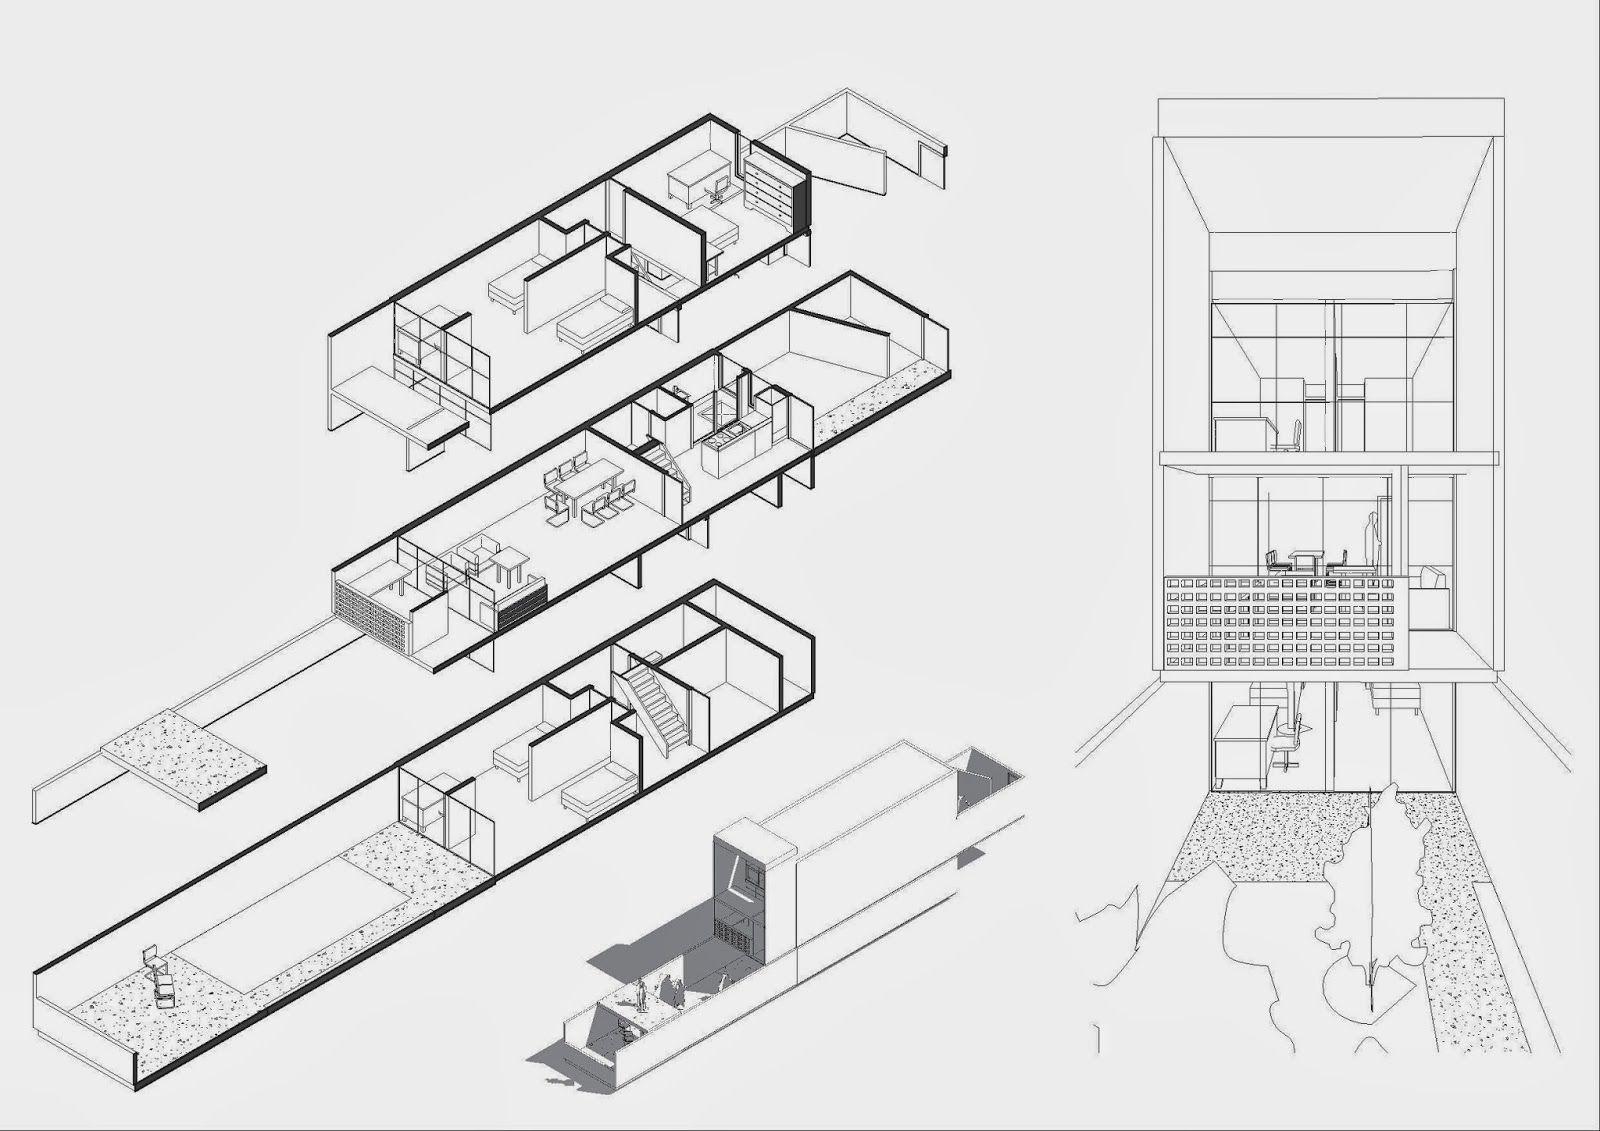 Historia de la arquitectura moderna siedlung halen for Arquitectura moderna